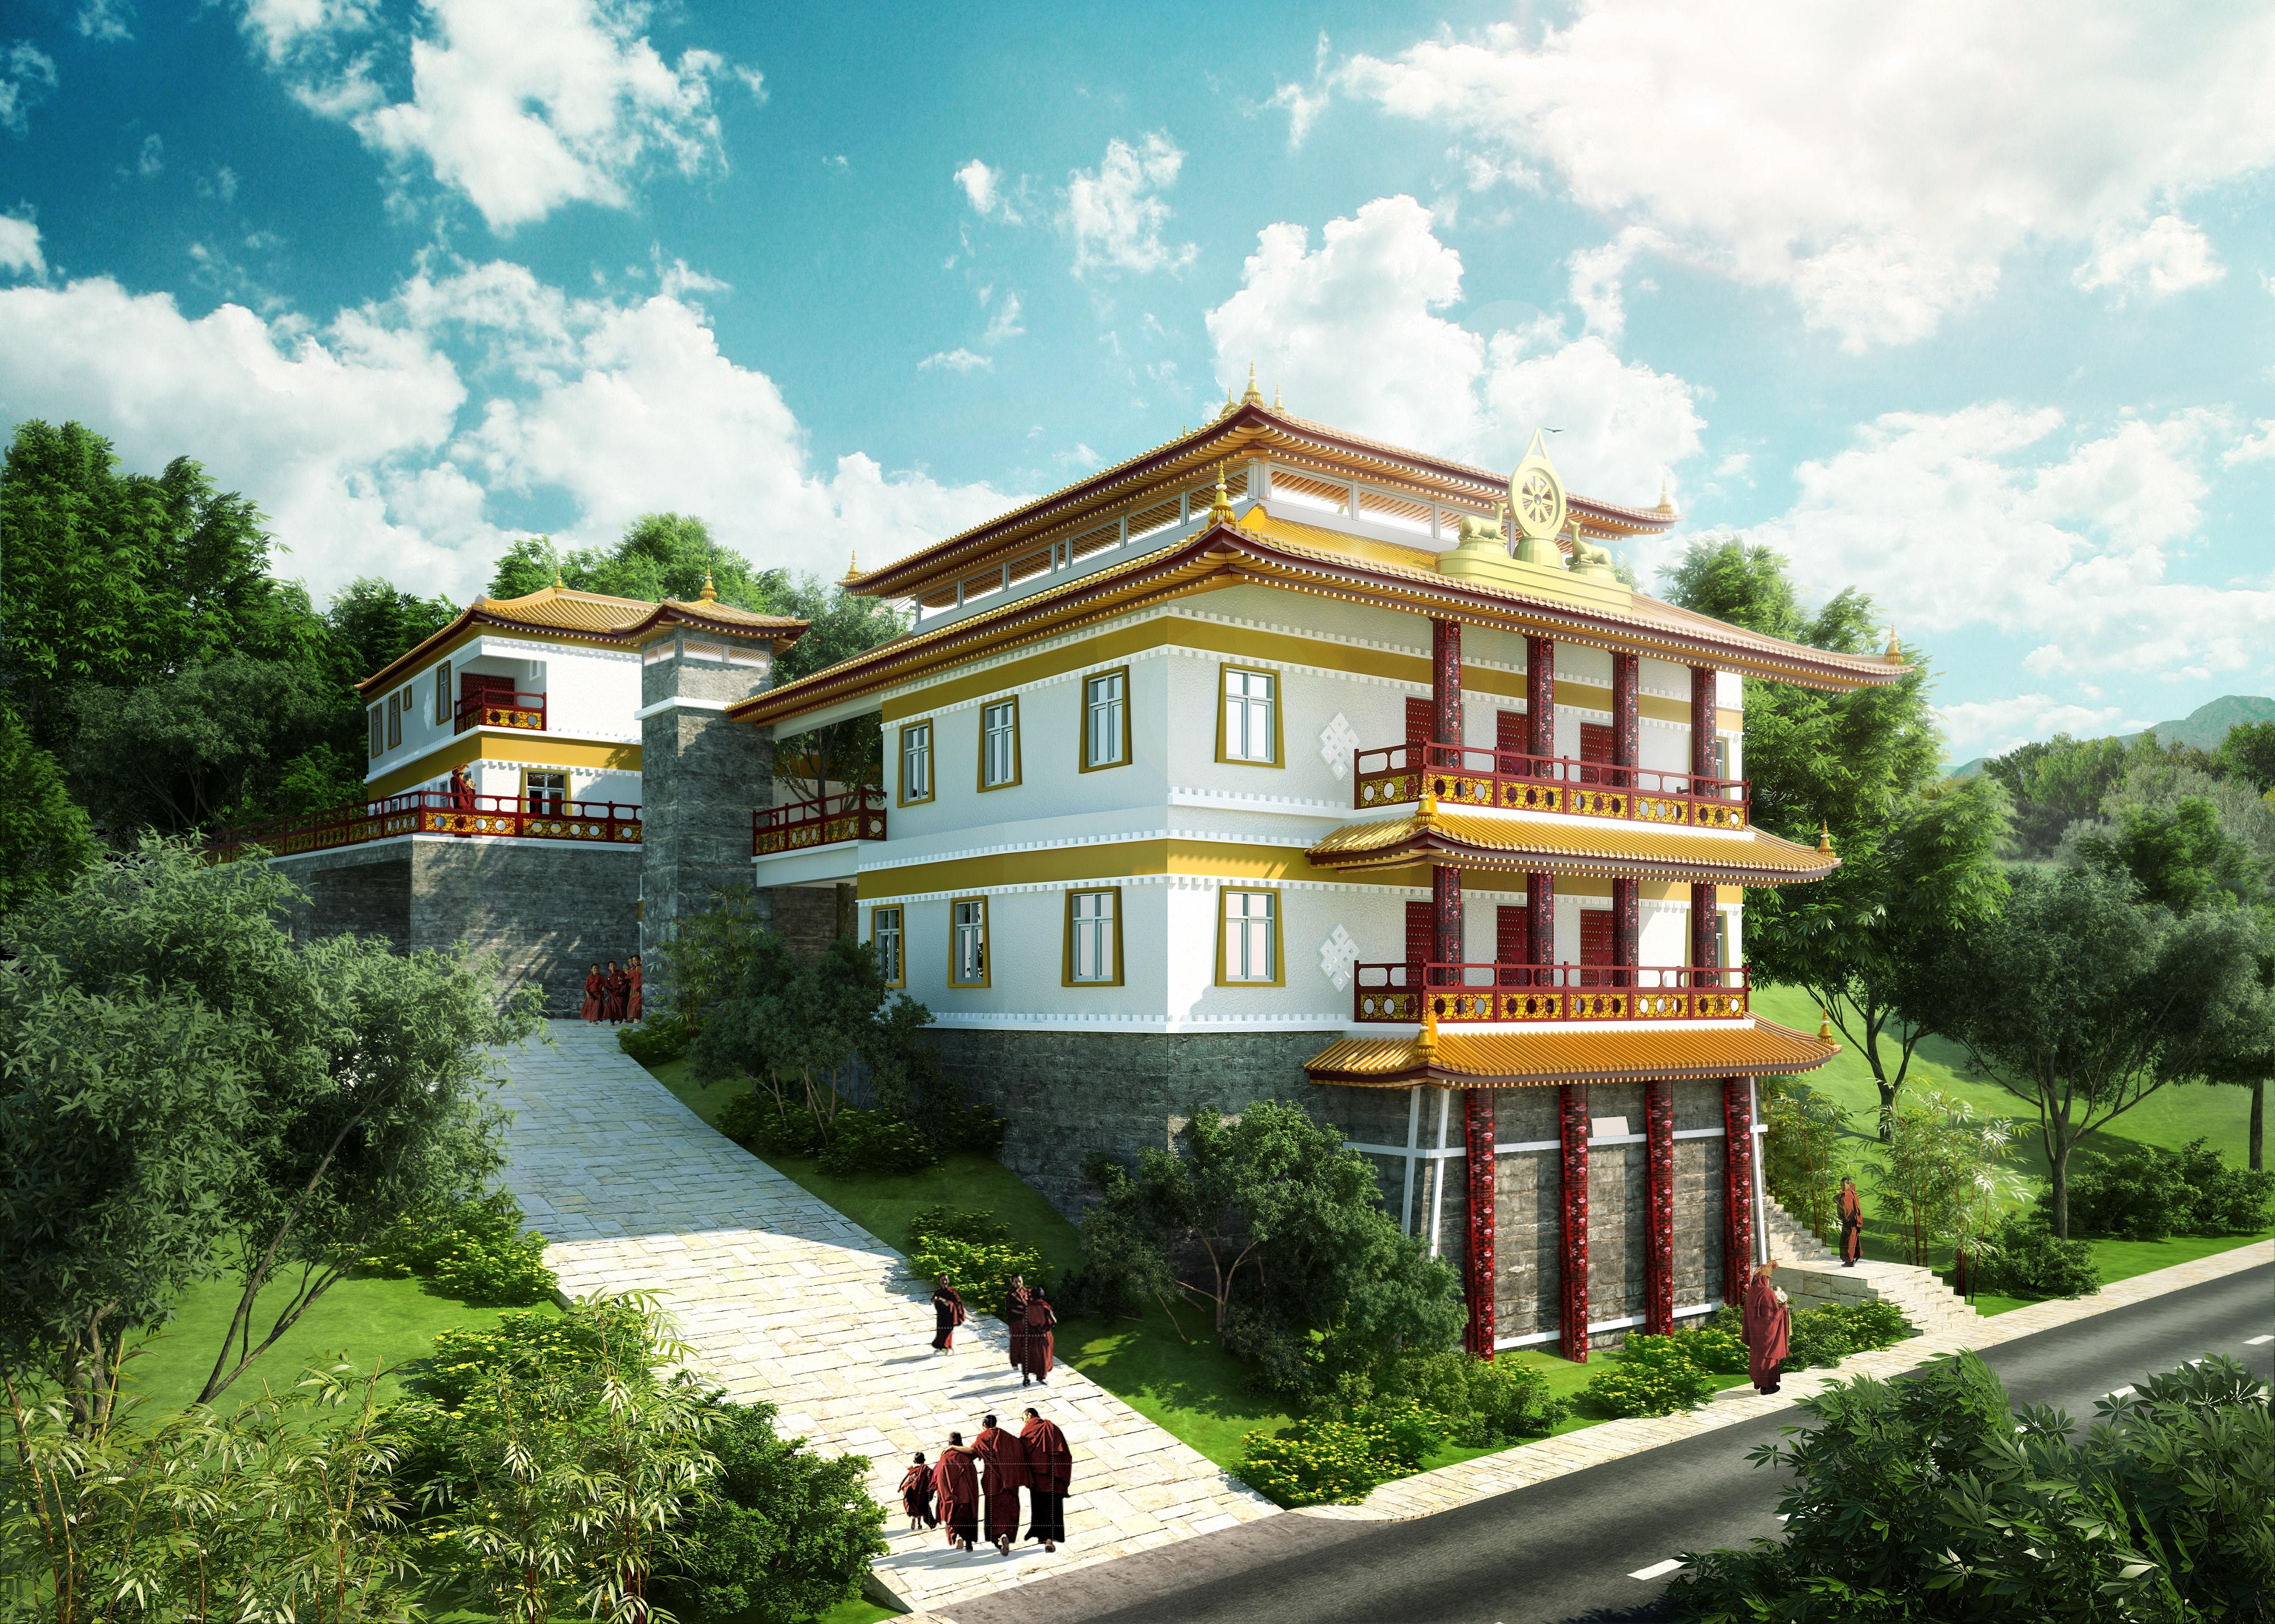 New Monastery - Artist Impression